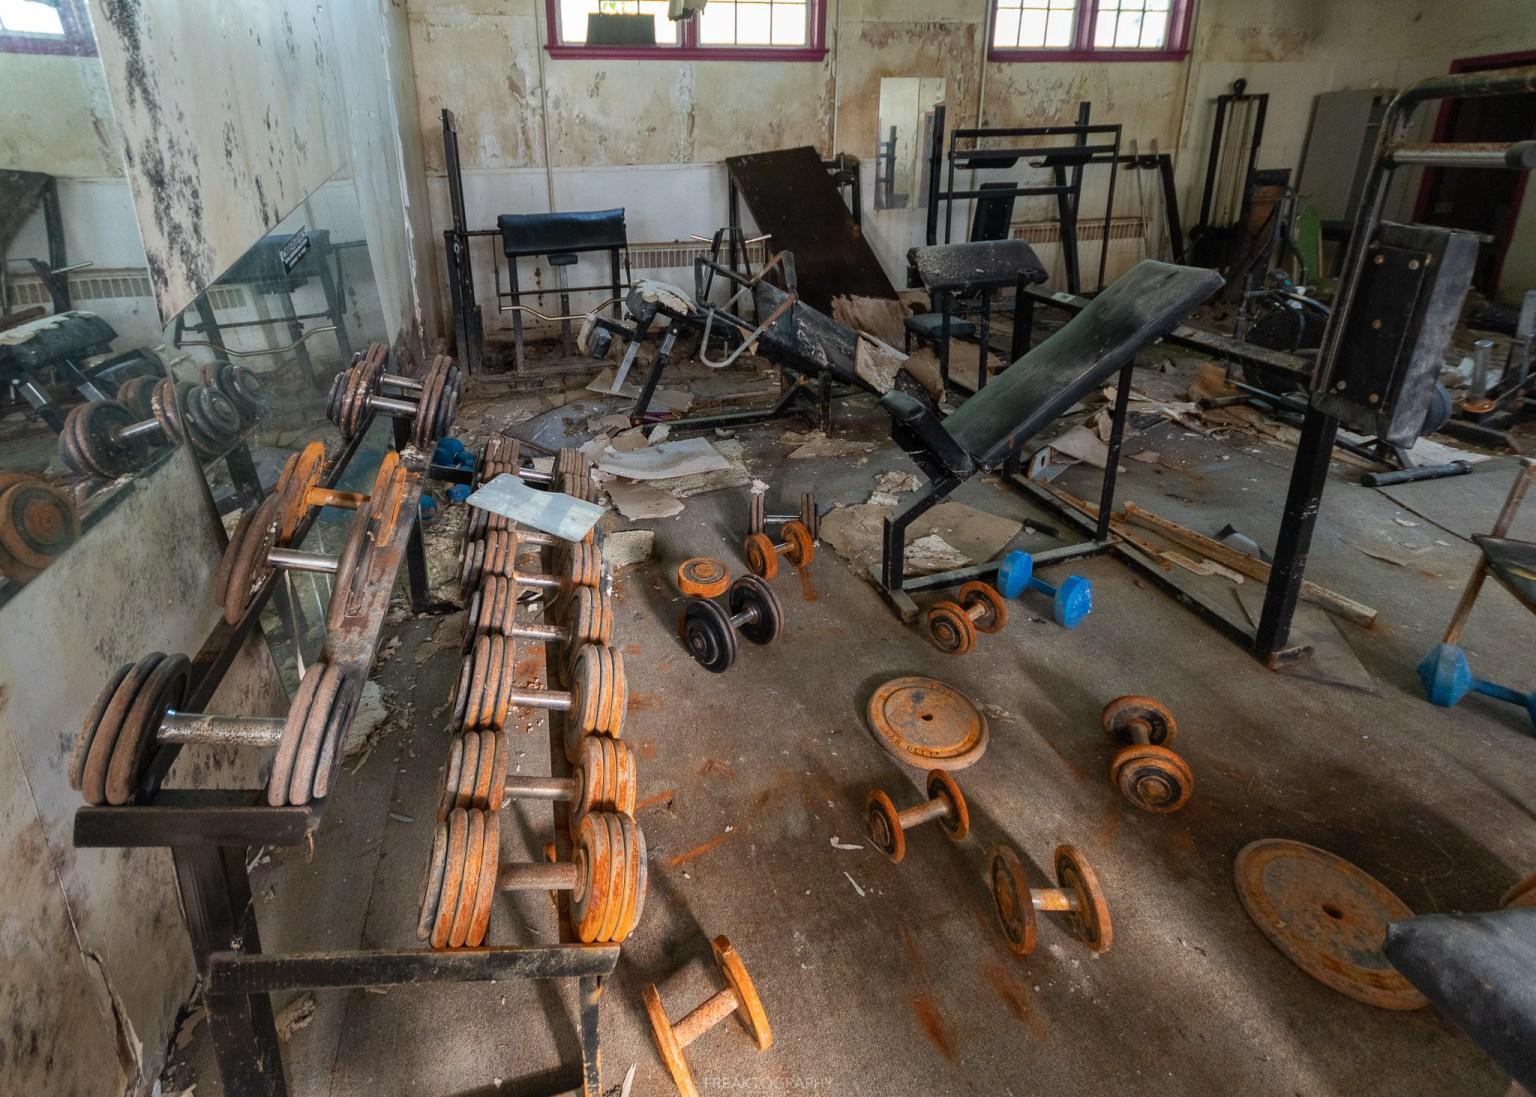 abandoned church and abandoned gym